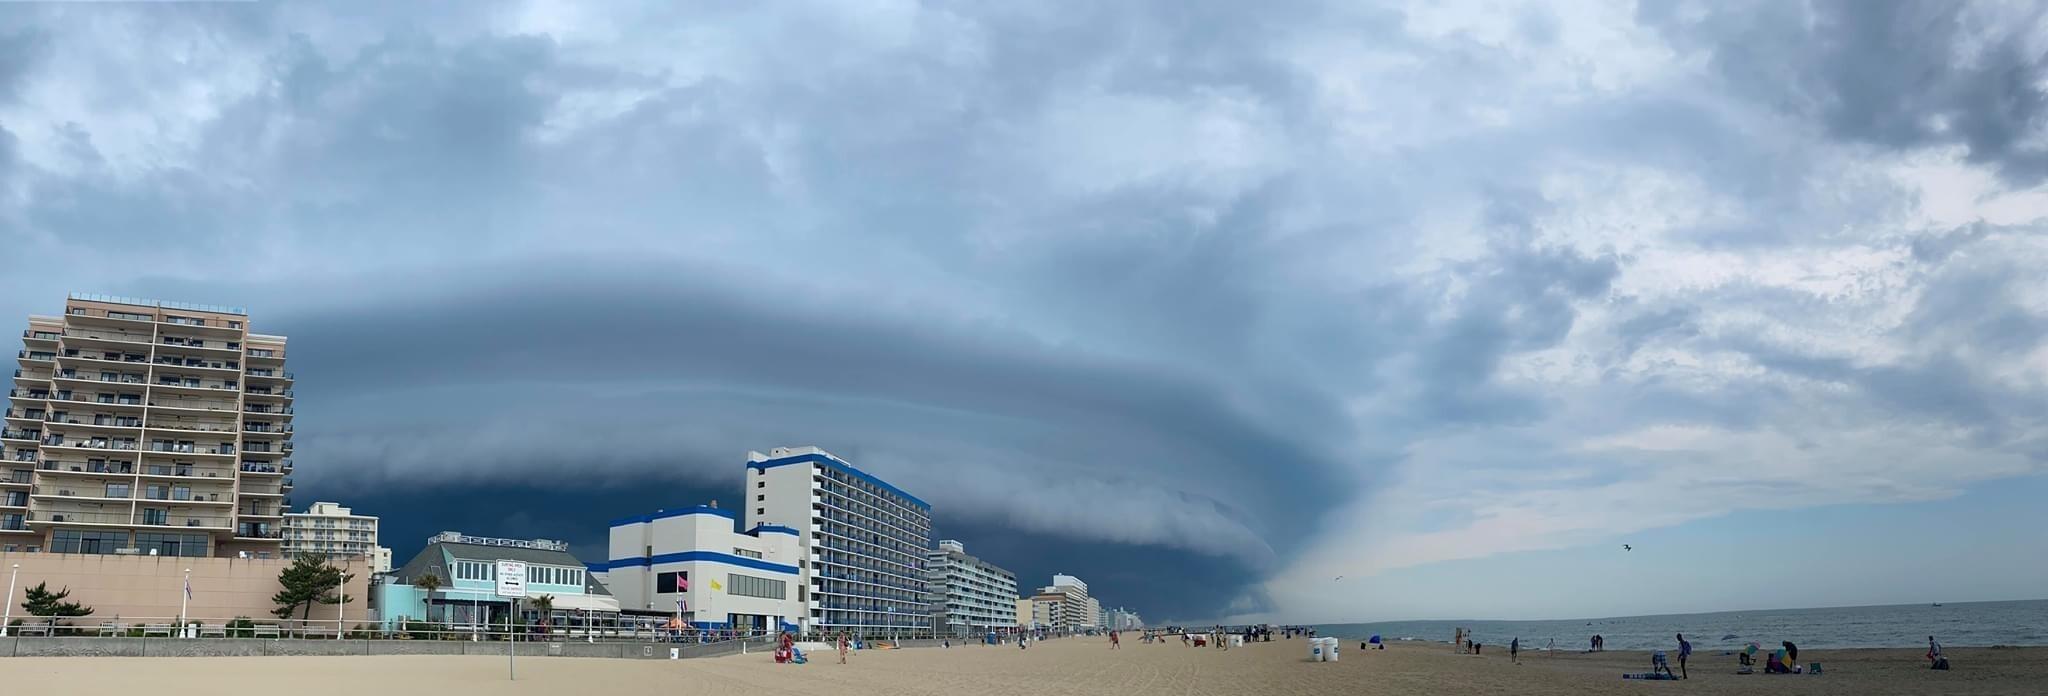 Virginia Beach Oceanfront (Shannon Barbarian).jpg